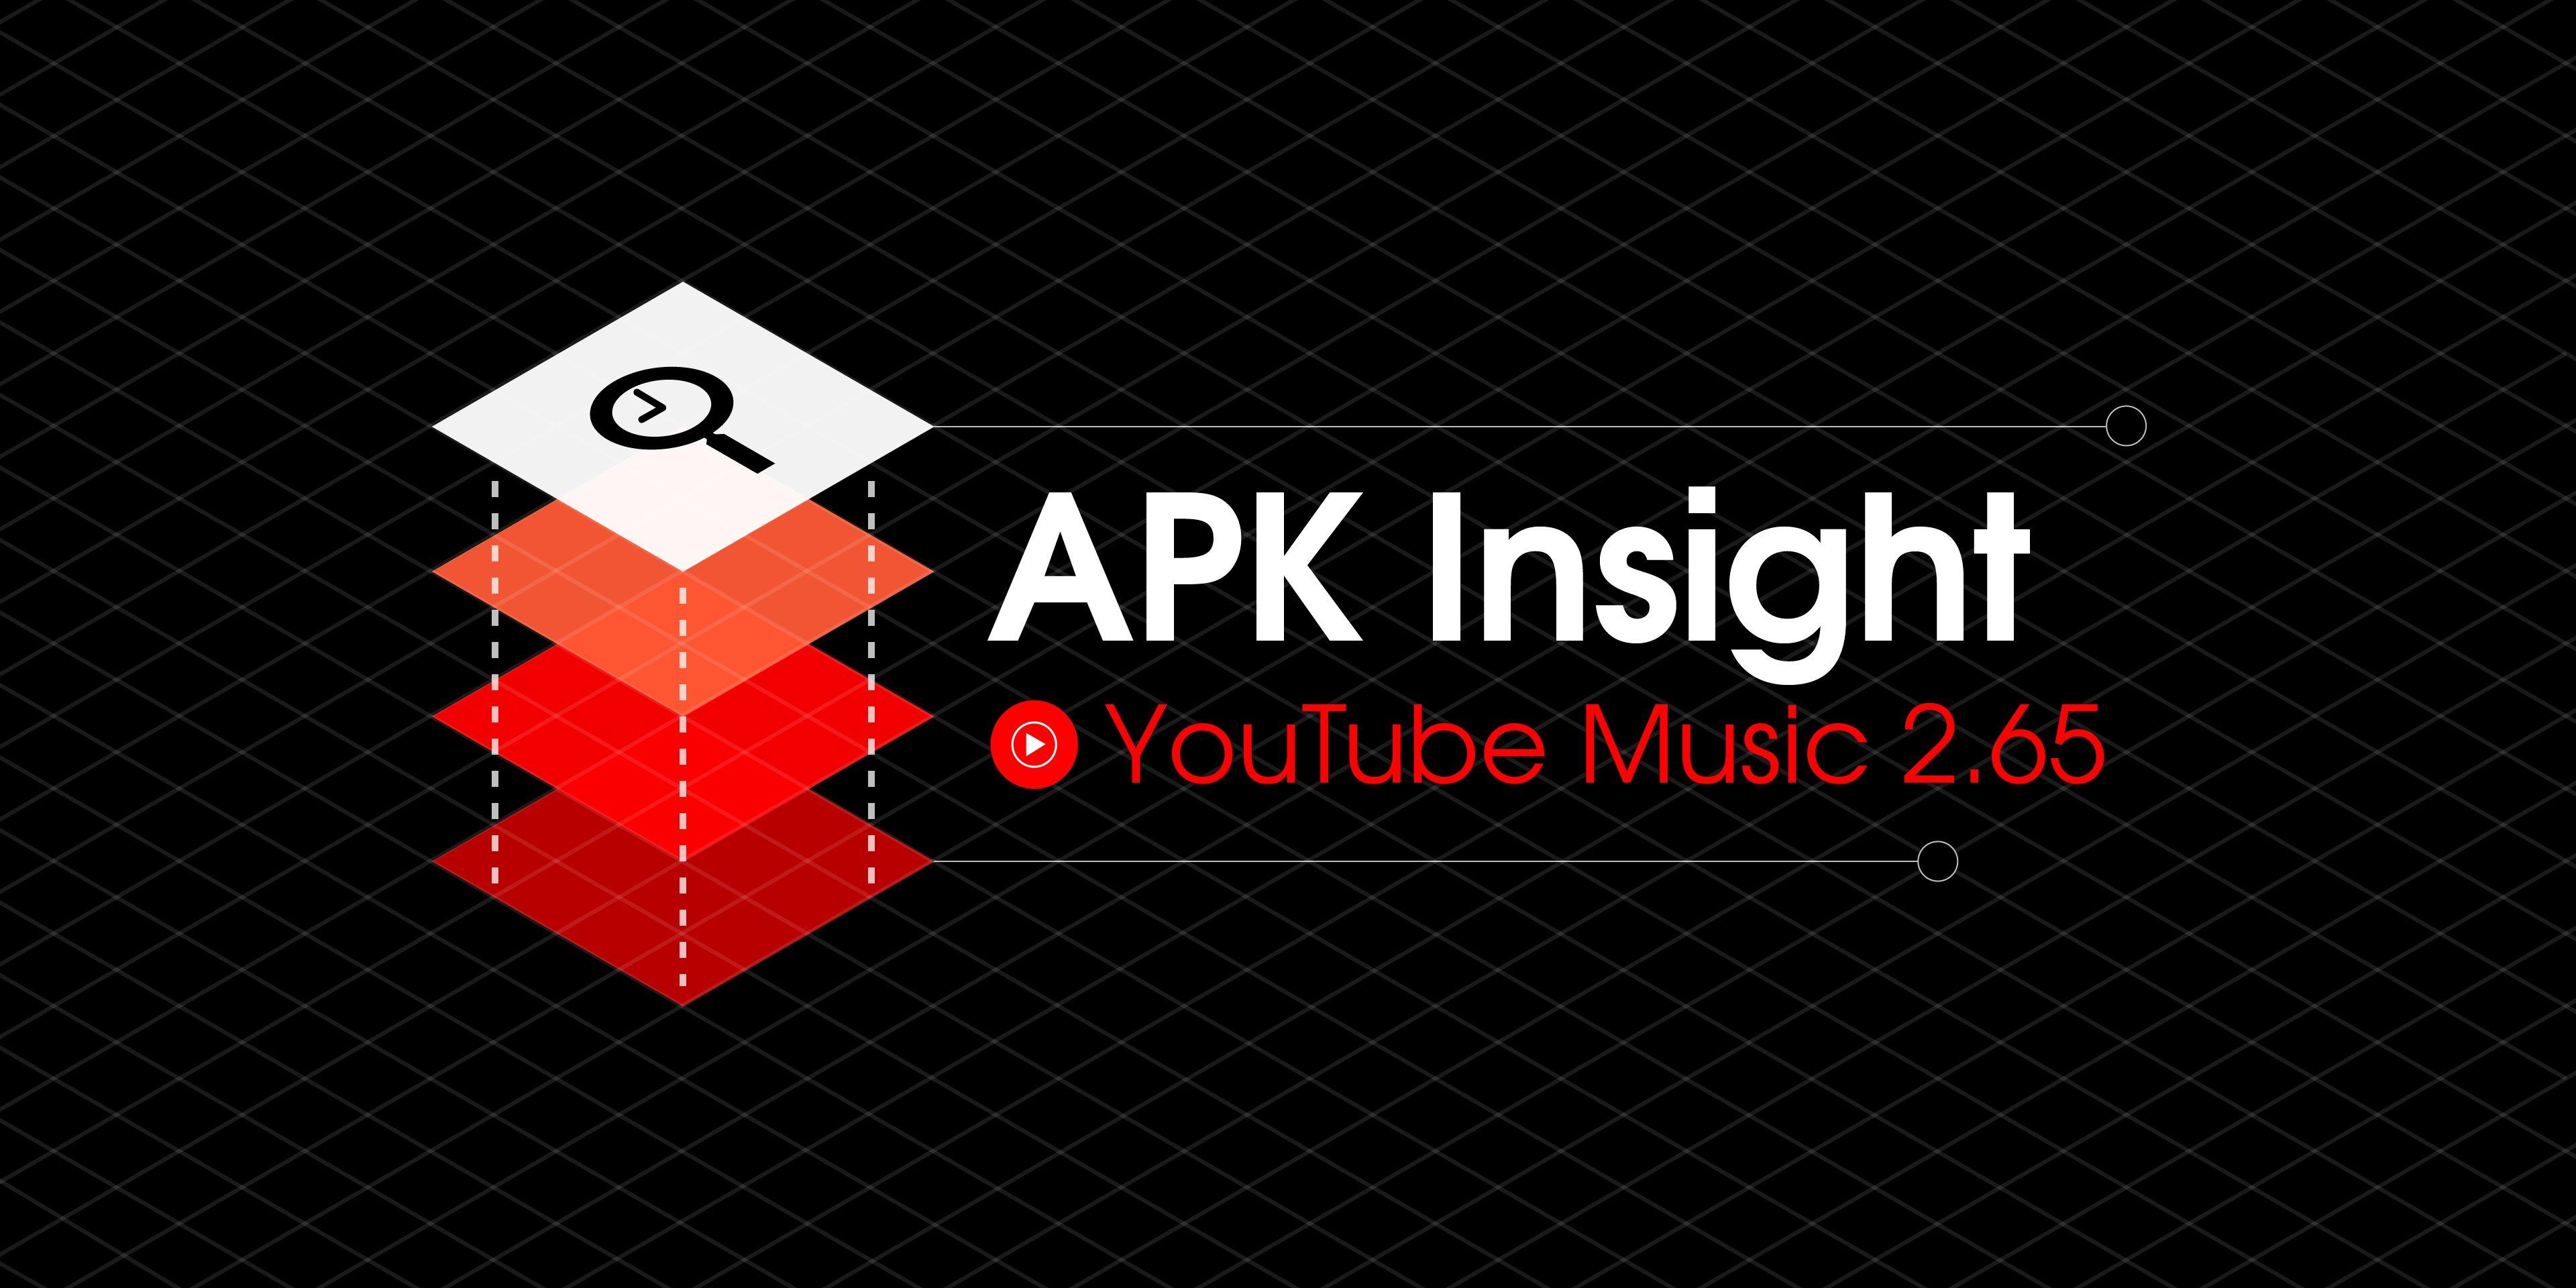 apk-insight-youtube-music-2-65.jpg